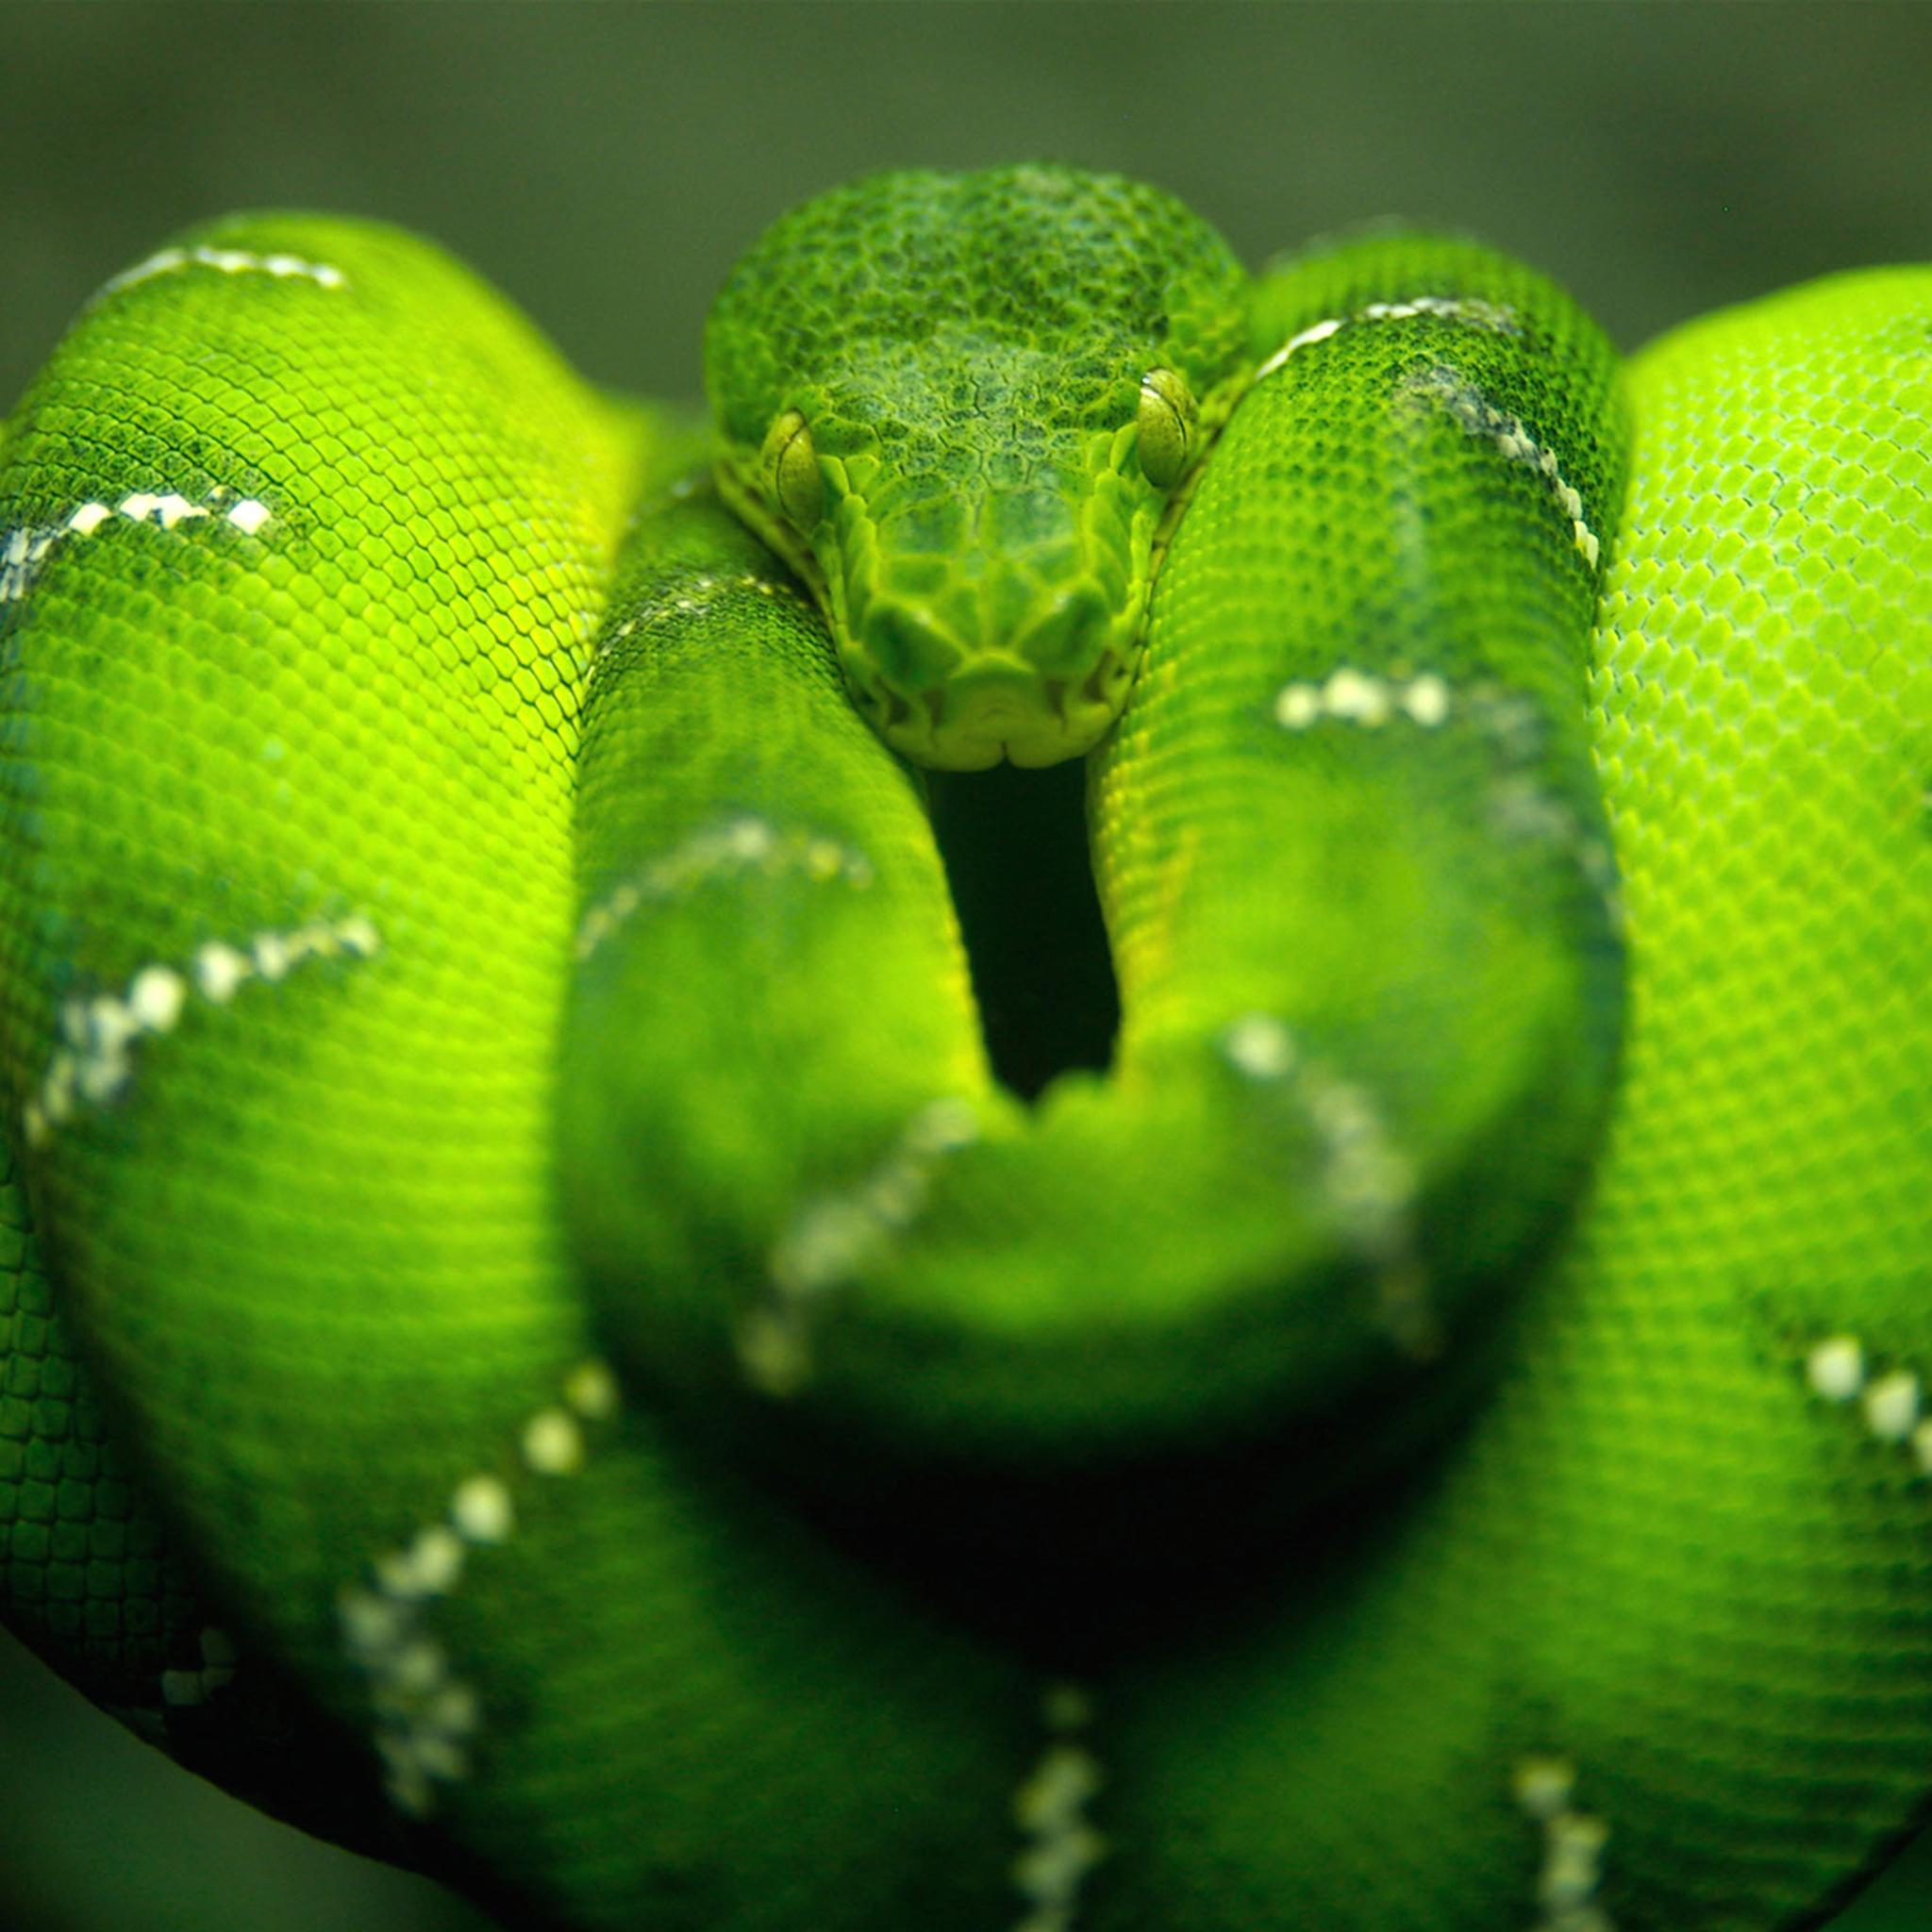 Green Snake 3Wallpapers iPad Retina Green Snake   iPad Retina